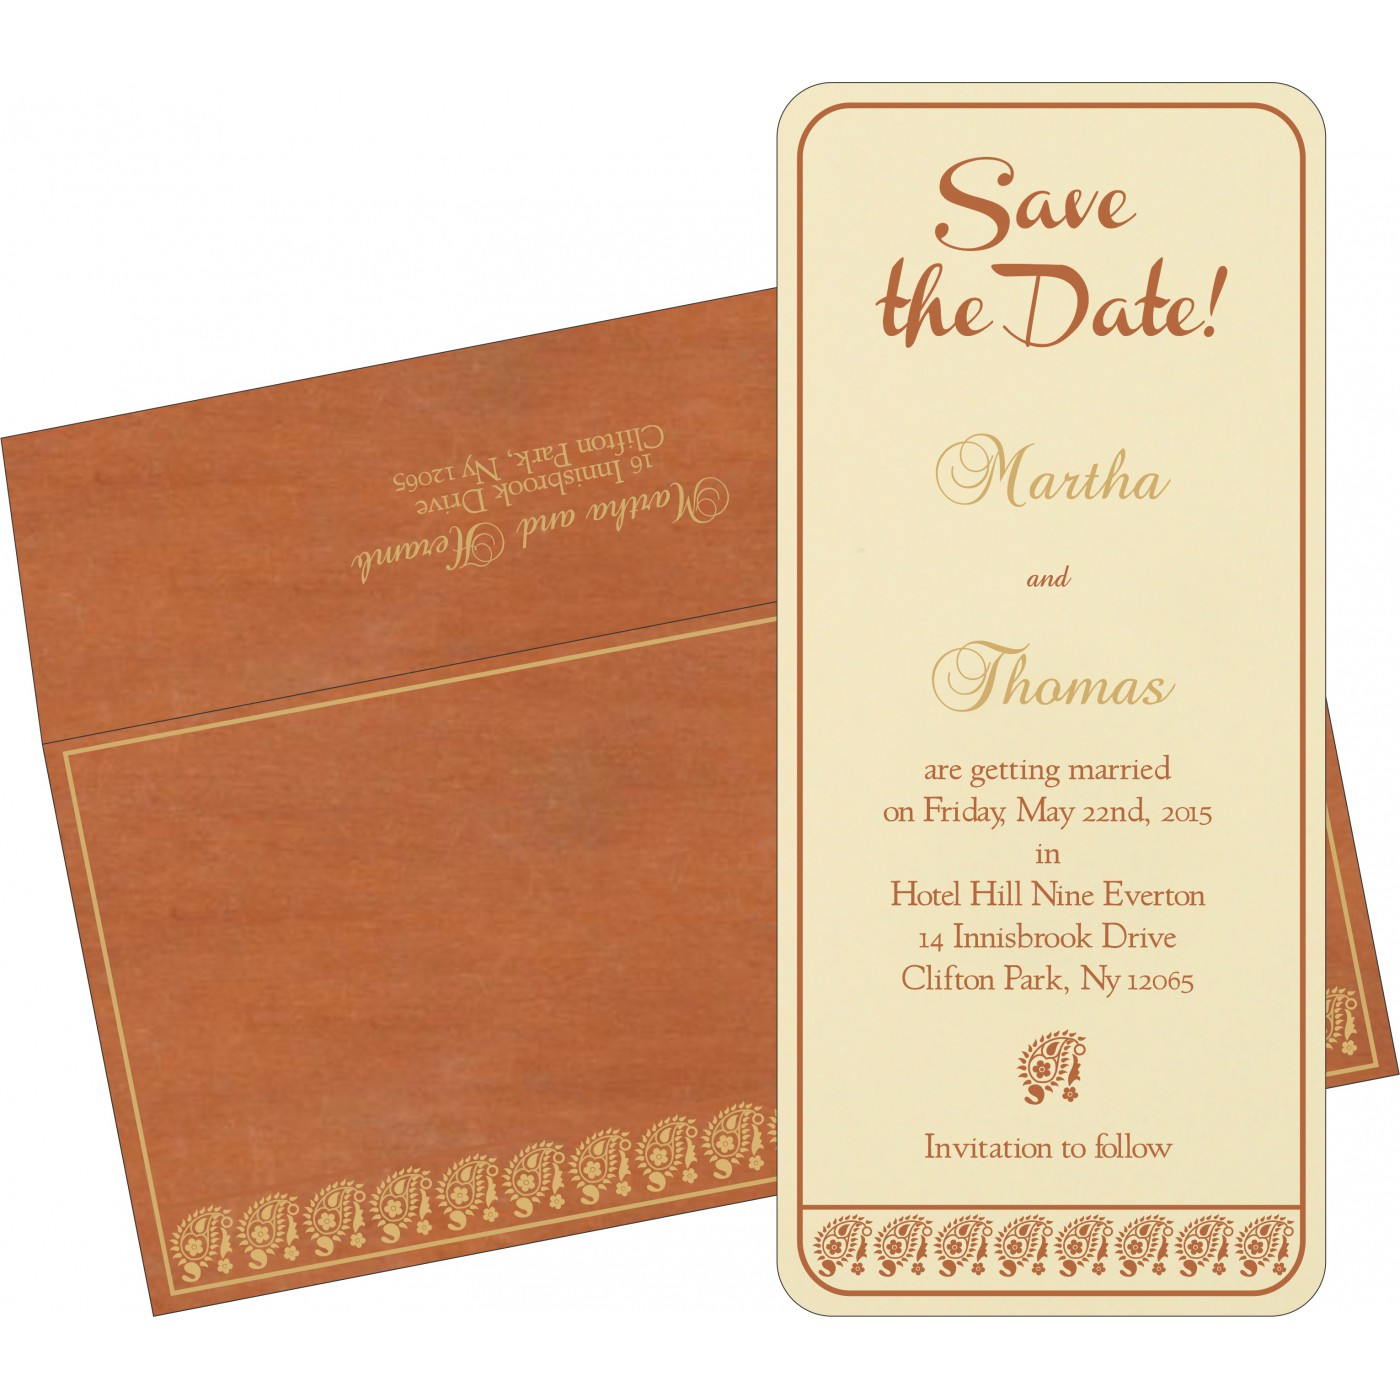 Save The Date - STD-8218C